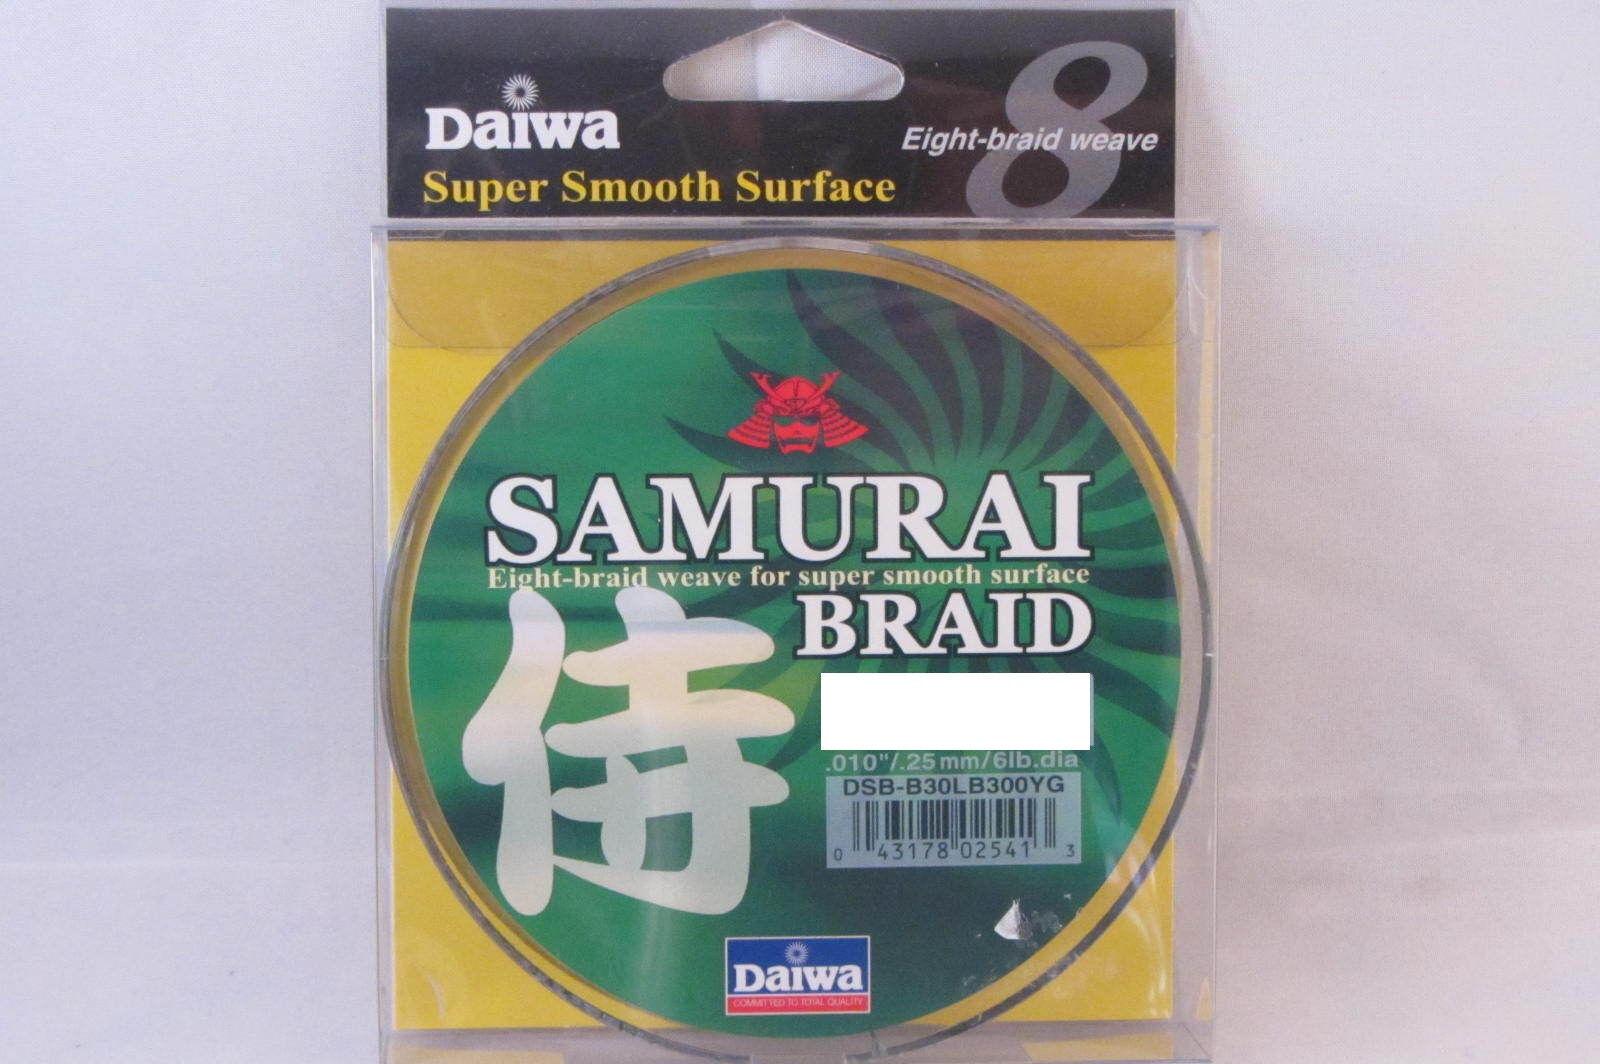 NEW DAIWA SAMURAI BRAID verde 20LB 300YD DSBB20LB300YG